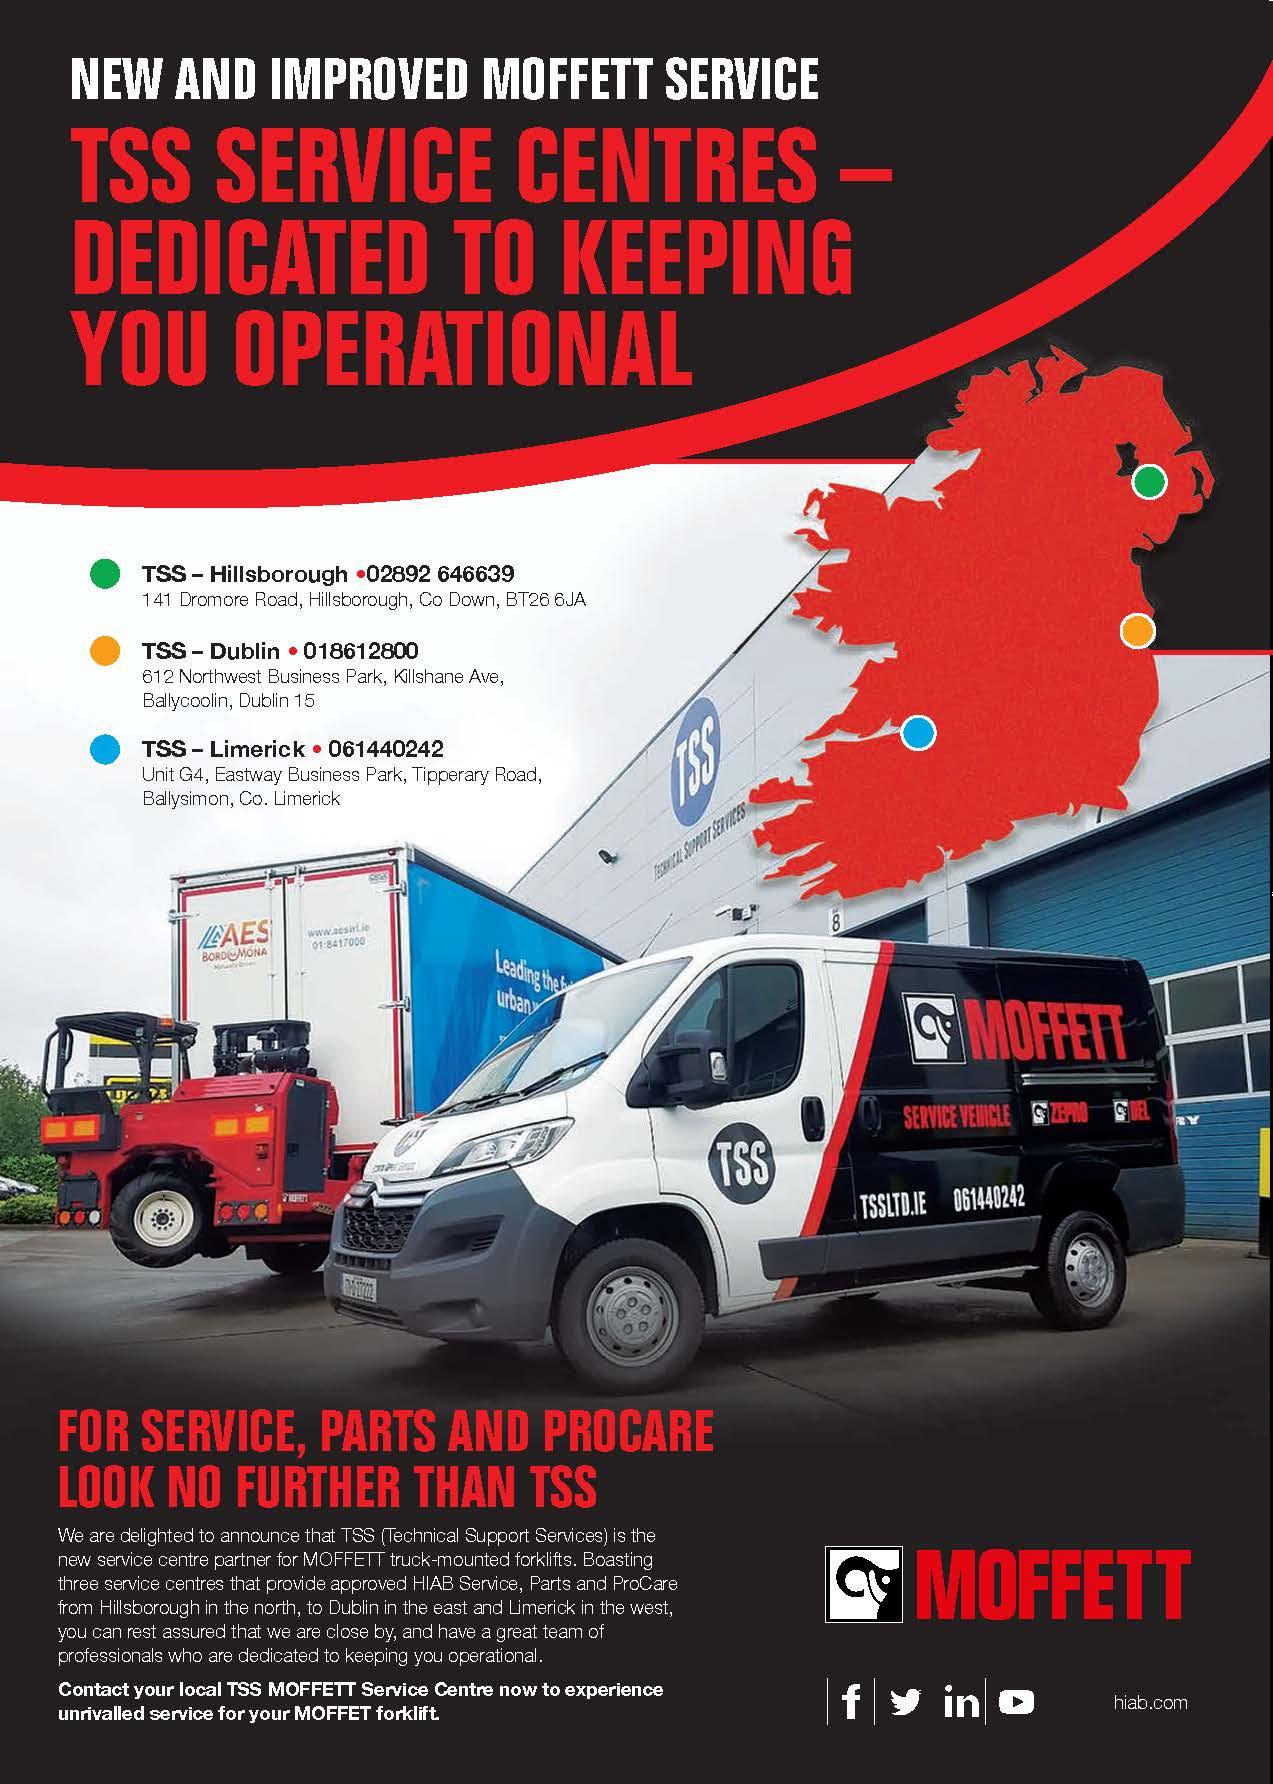 tss-ltd-moffett-truck-mounted-forklift-service-agent-for-ireland